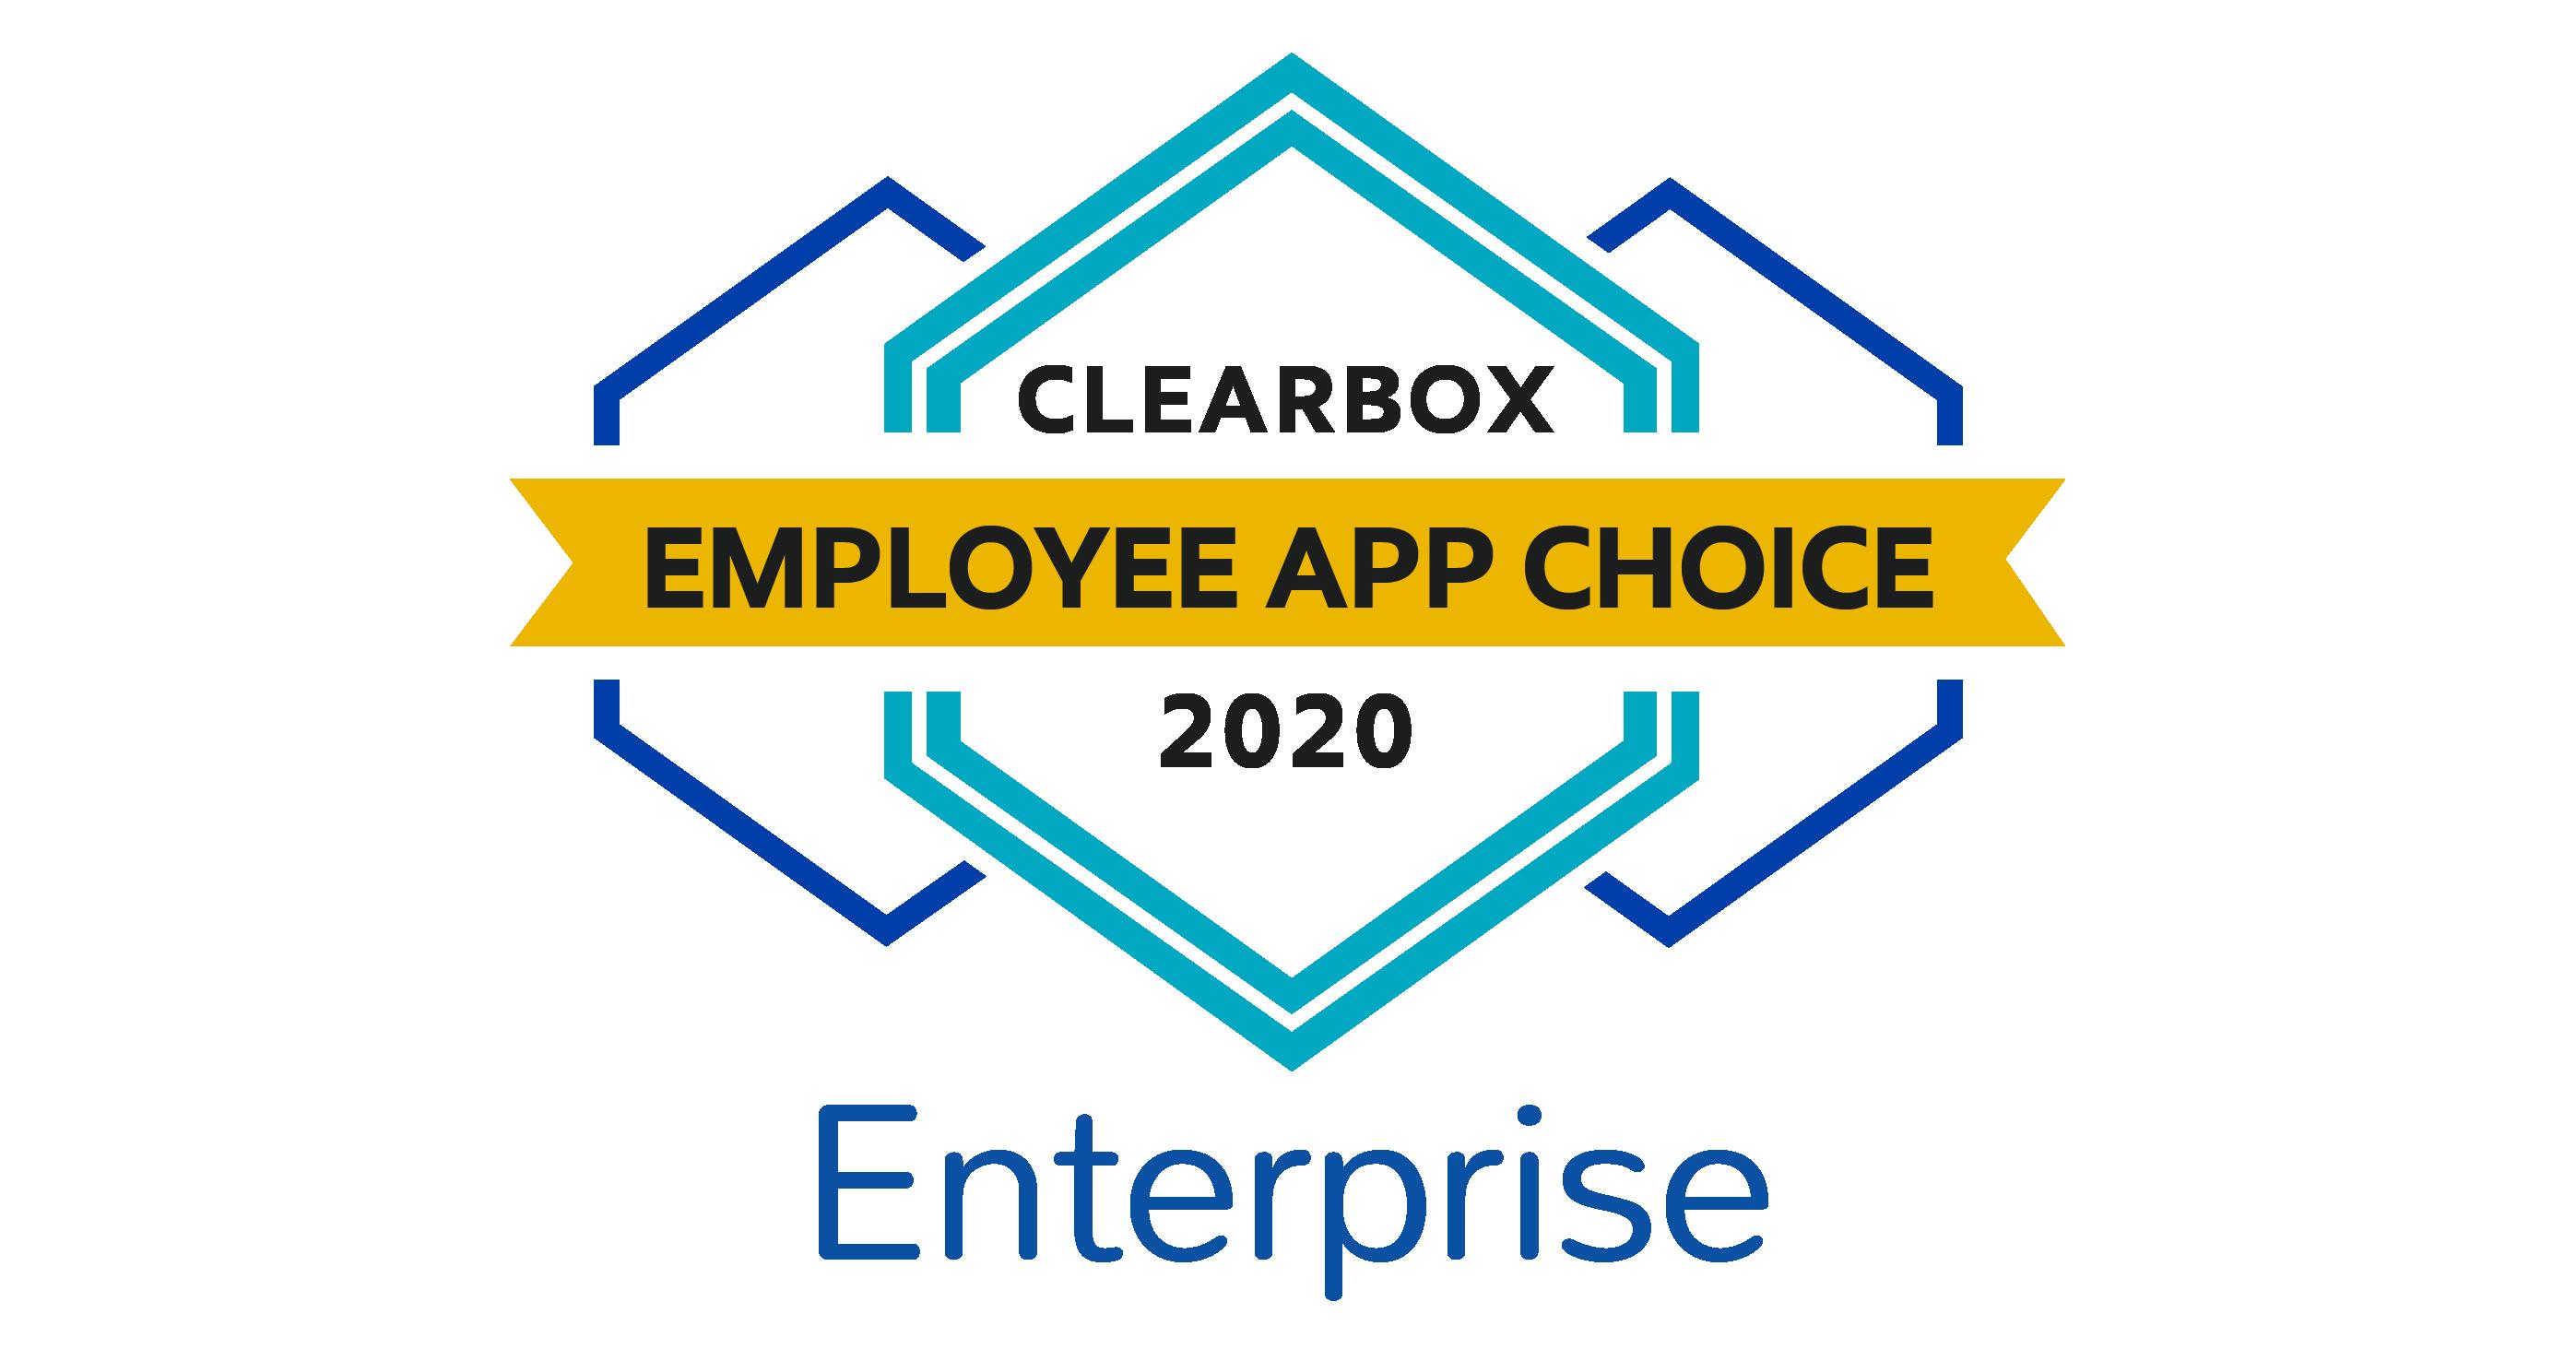 Employee app choice enterprise 2020.